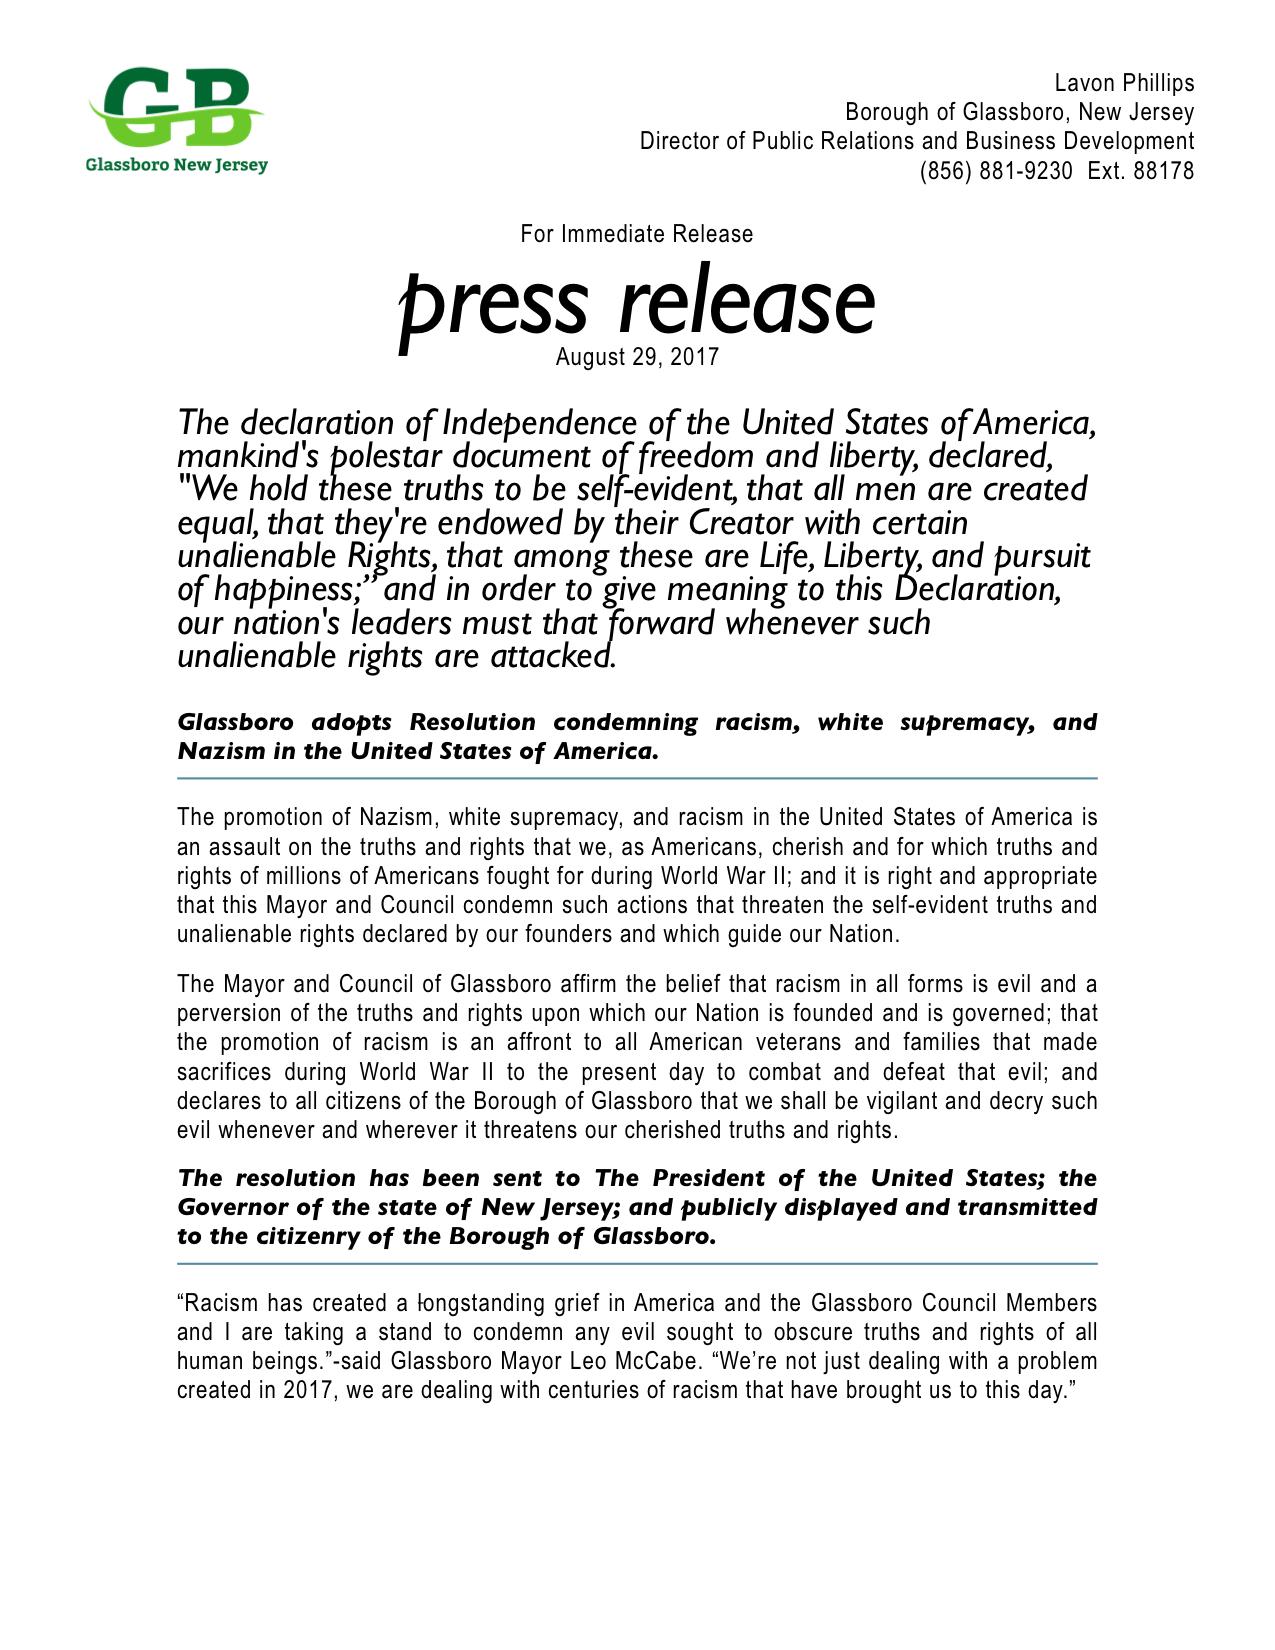 VERSION 2: Glassboro NJ Press Release Resolution Condemning Racism.jpeg